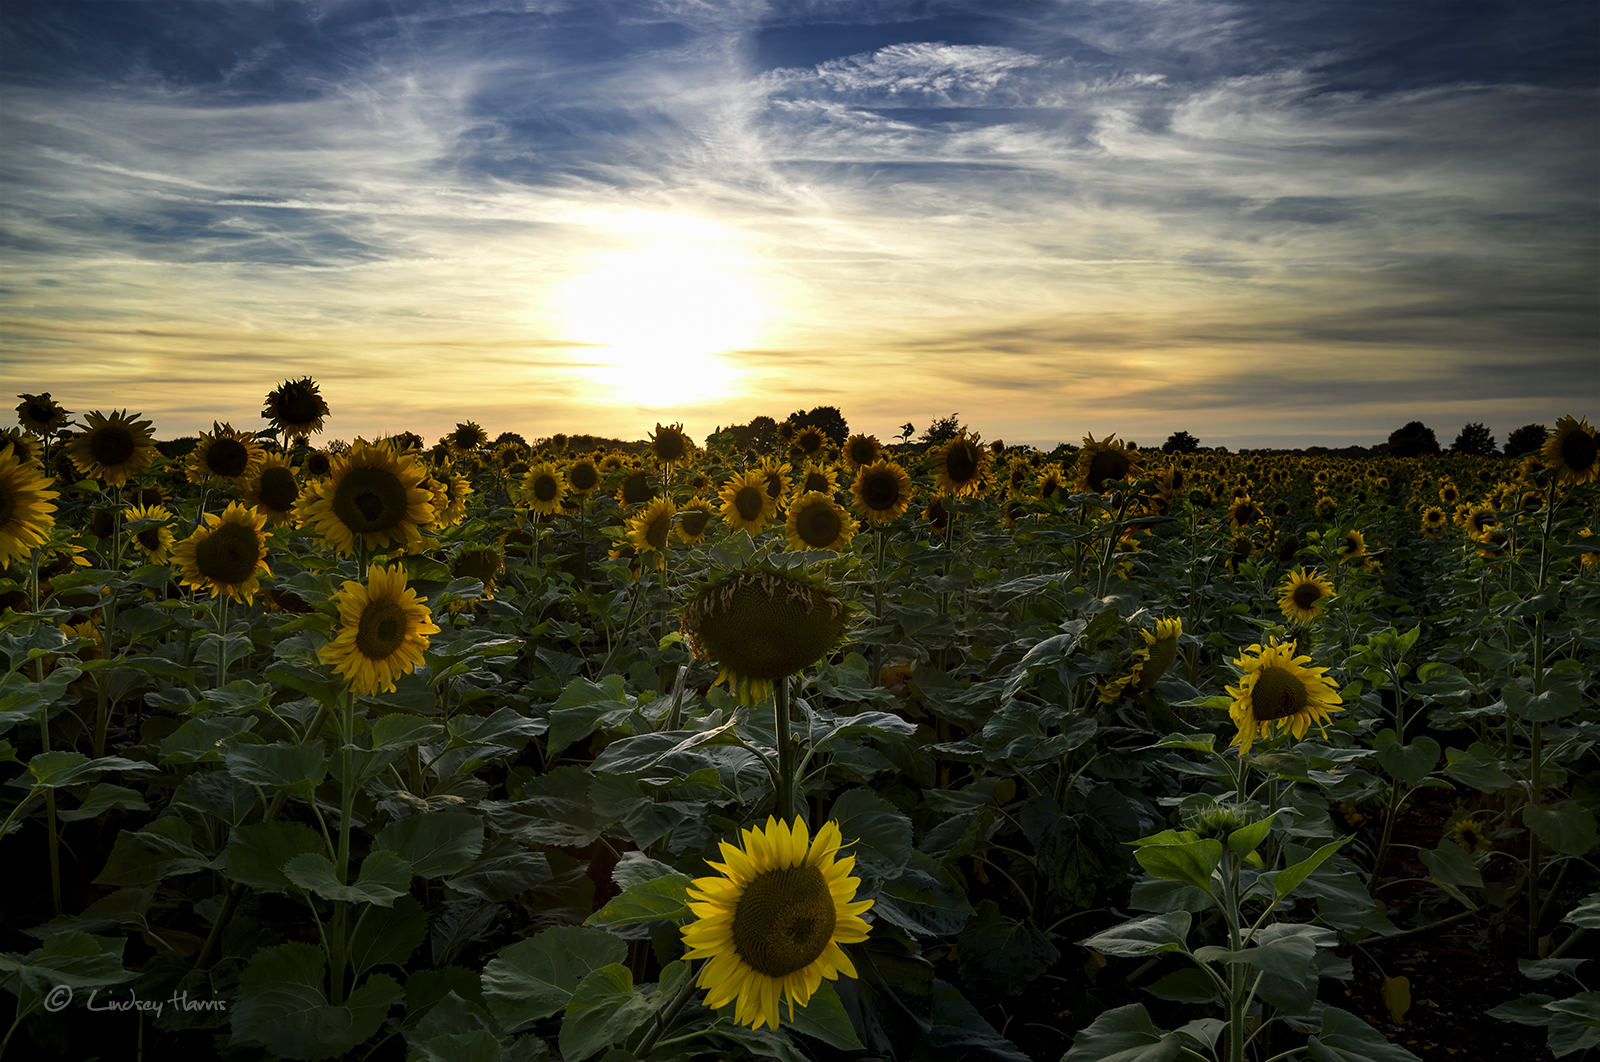 Field Of Sunflowers Dorset Sunset